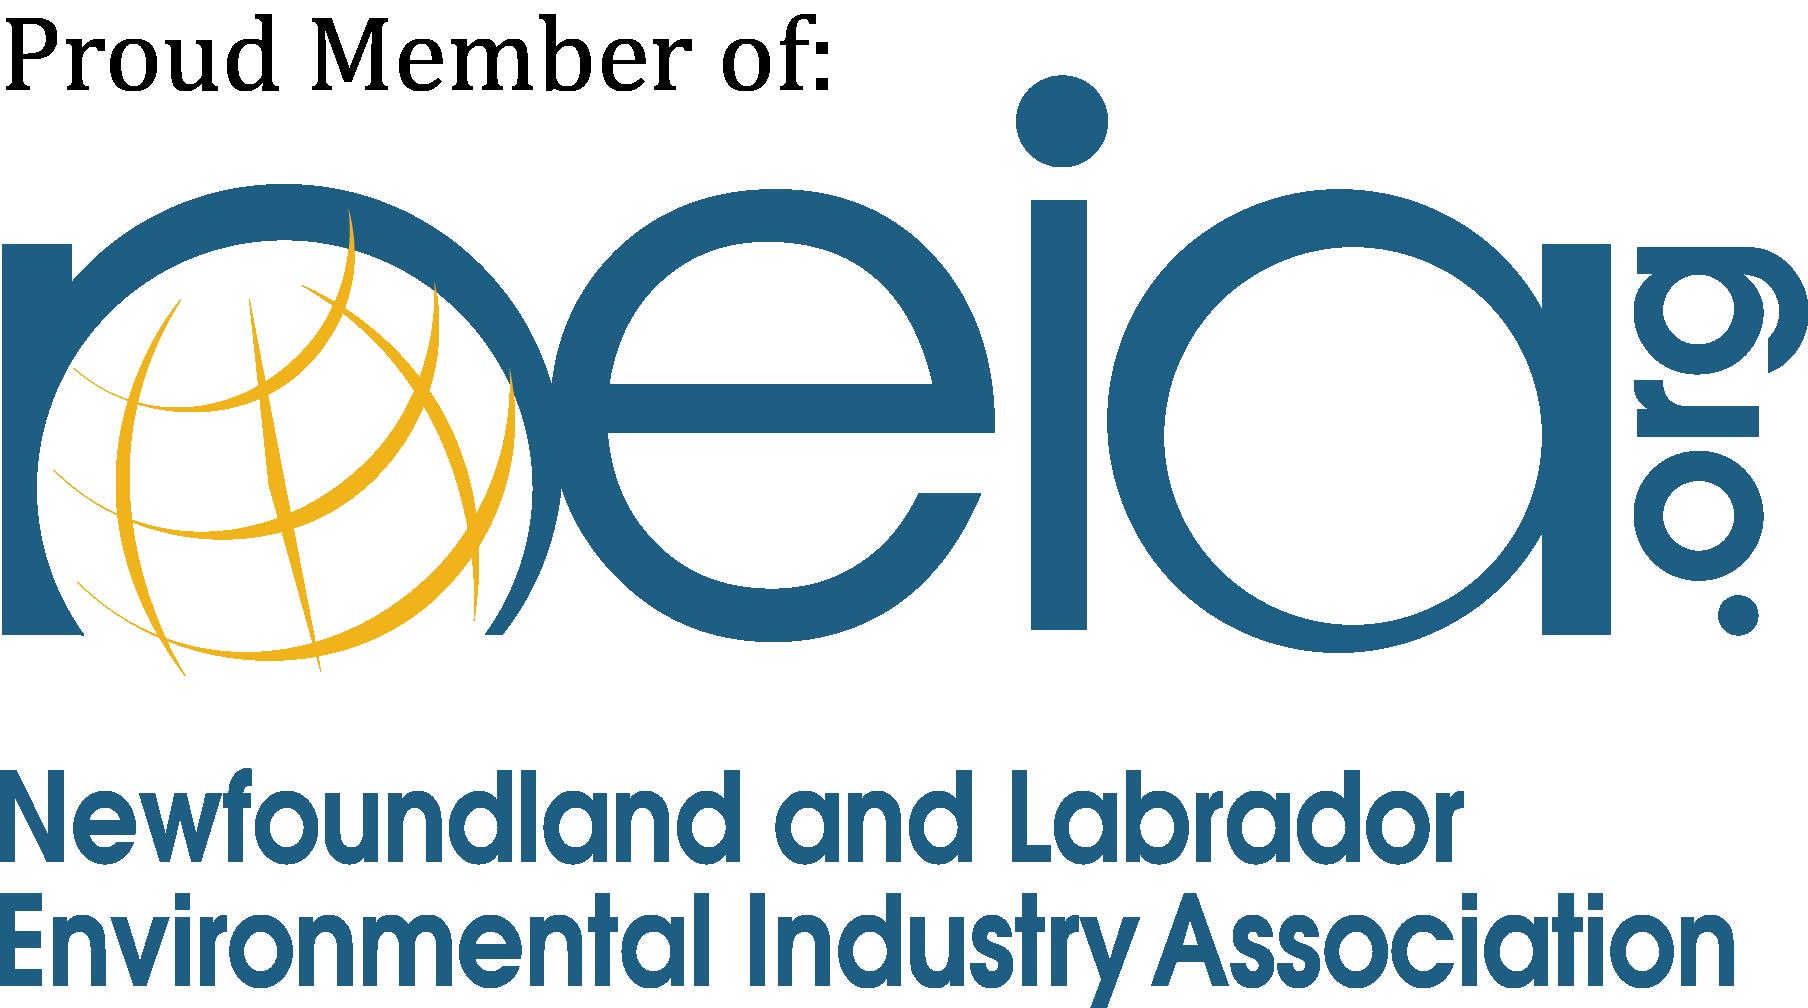 Newfoundland and Labrador Environmental Industry Association